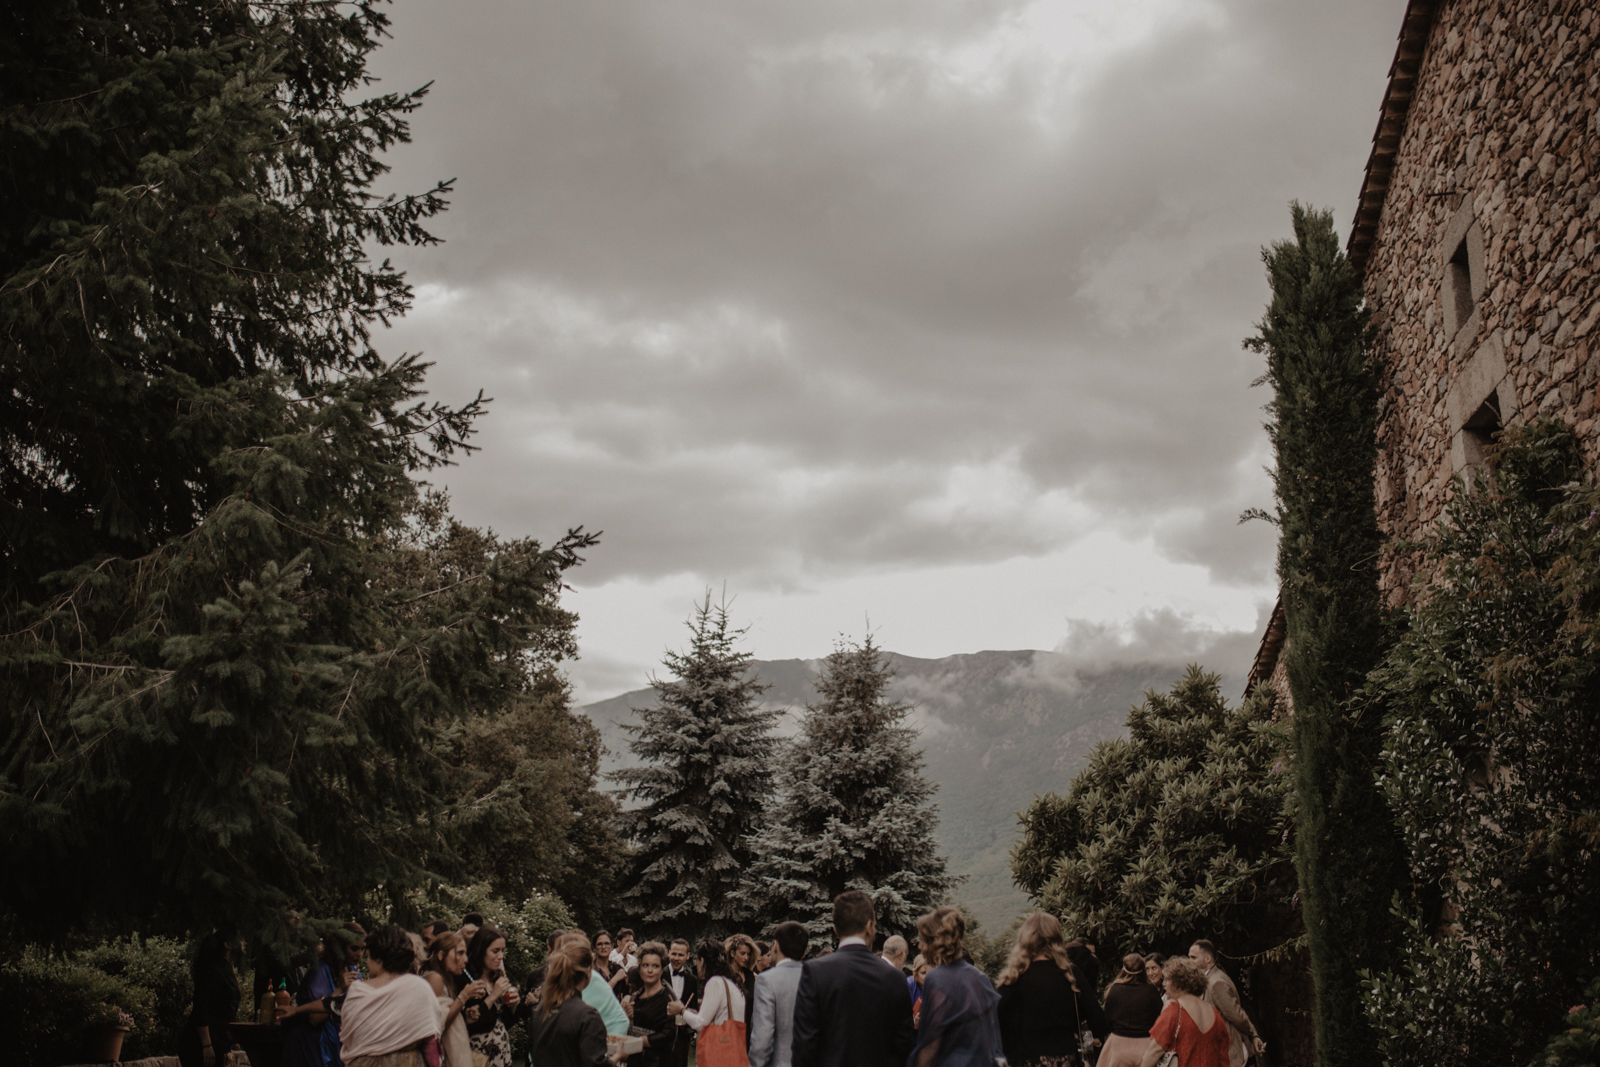 thenortherngirlphotography_photography_thenortherngirl_rebeccascabros_wedding_weddingphotography_weddingphotographer_barcelona_bodaenbarcelona_bodaenmaselmarti_bodarogeryvane-301.jpg